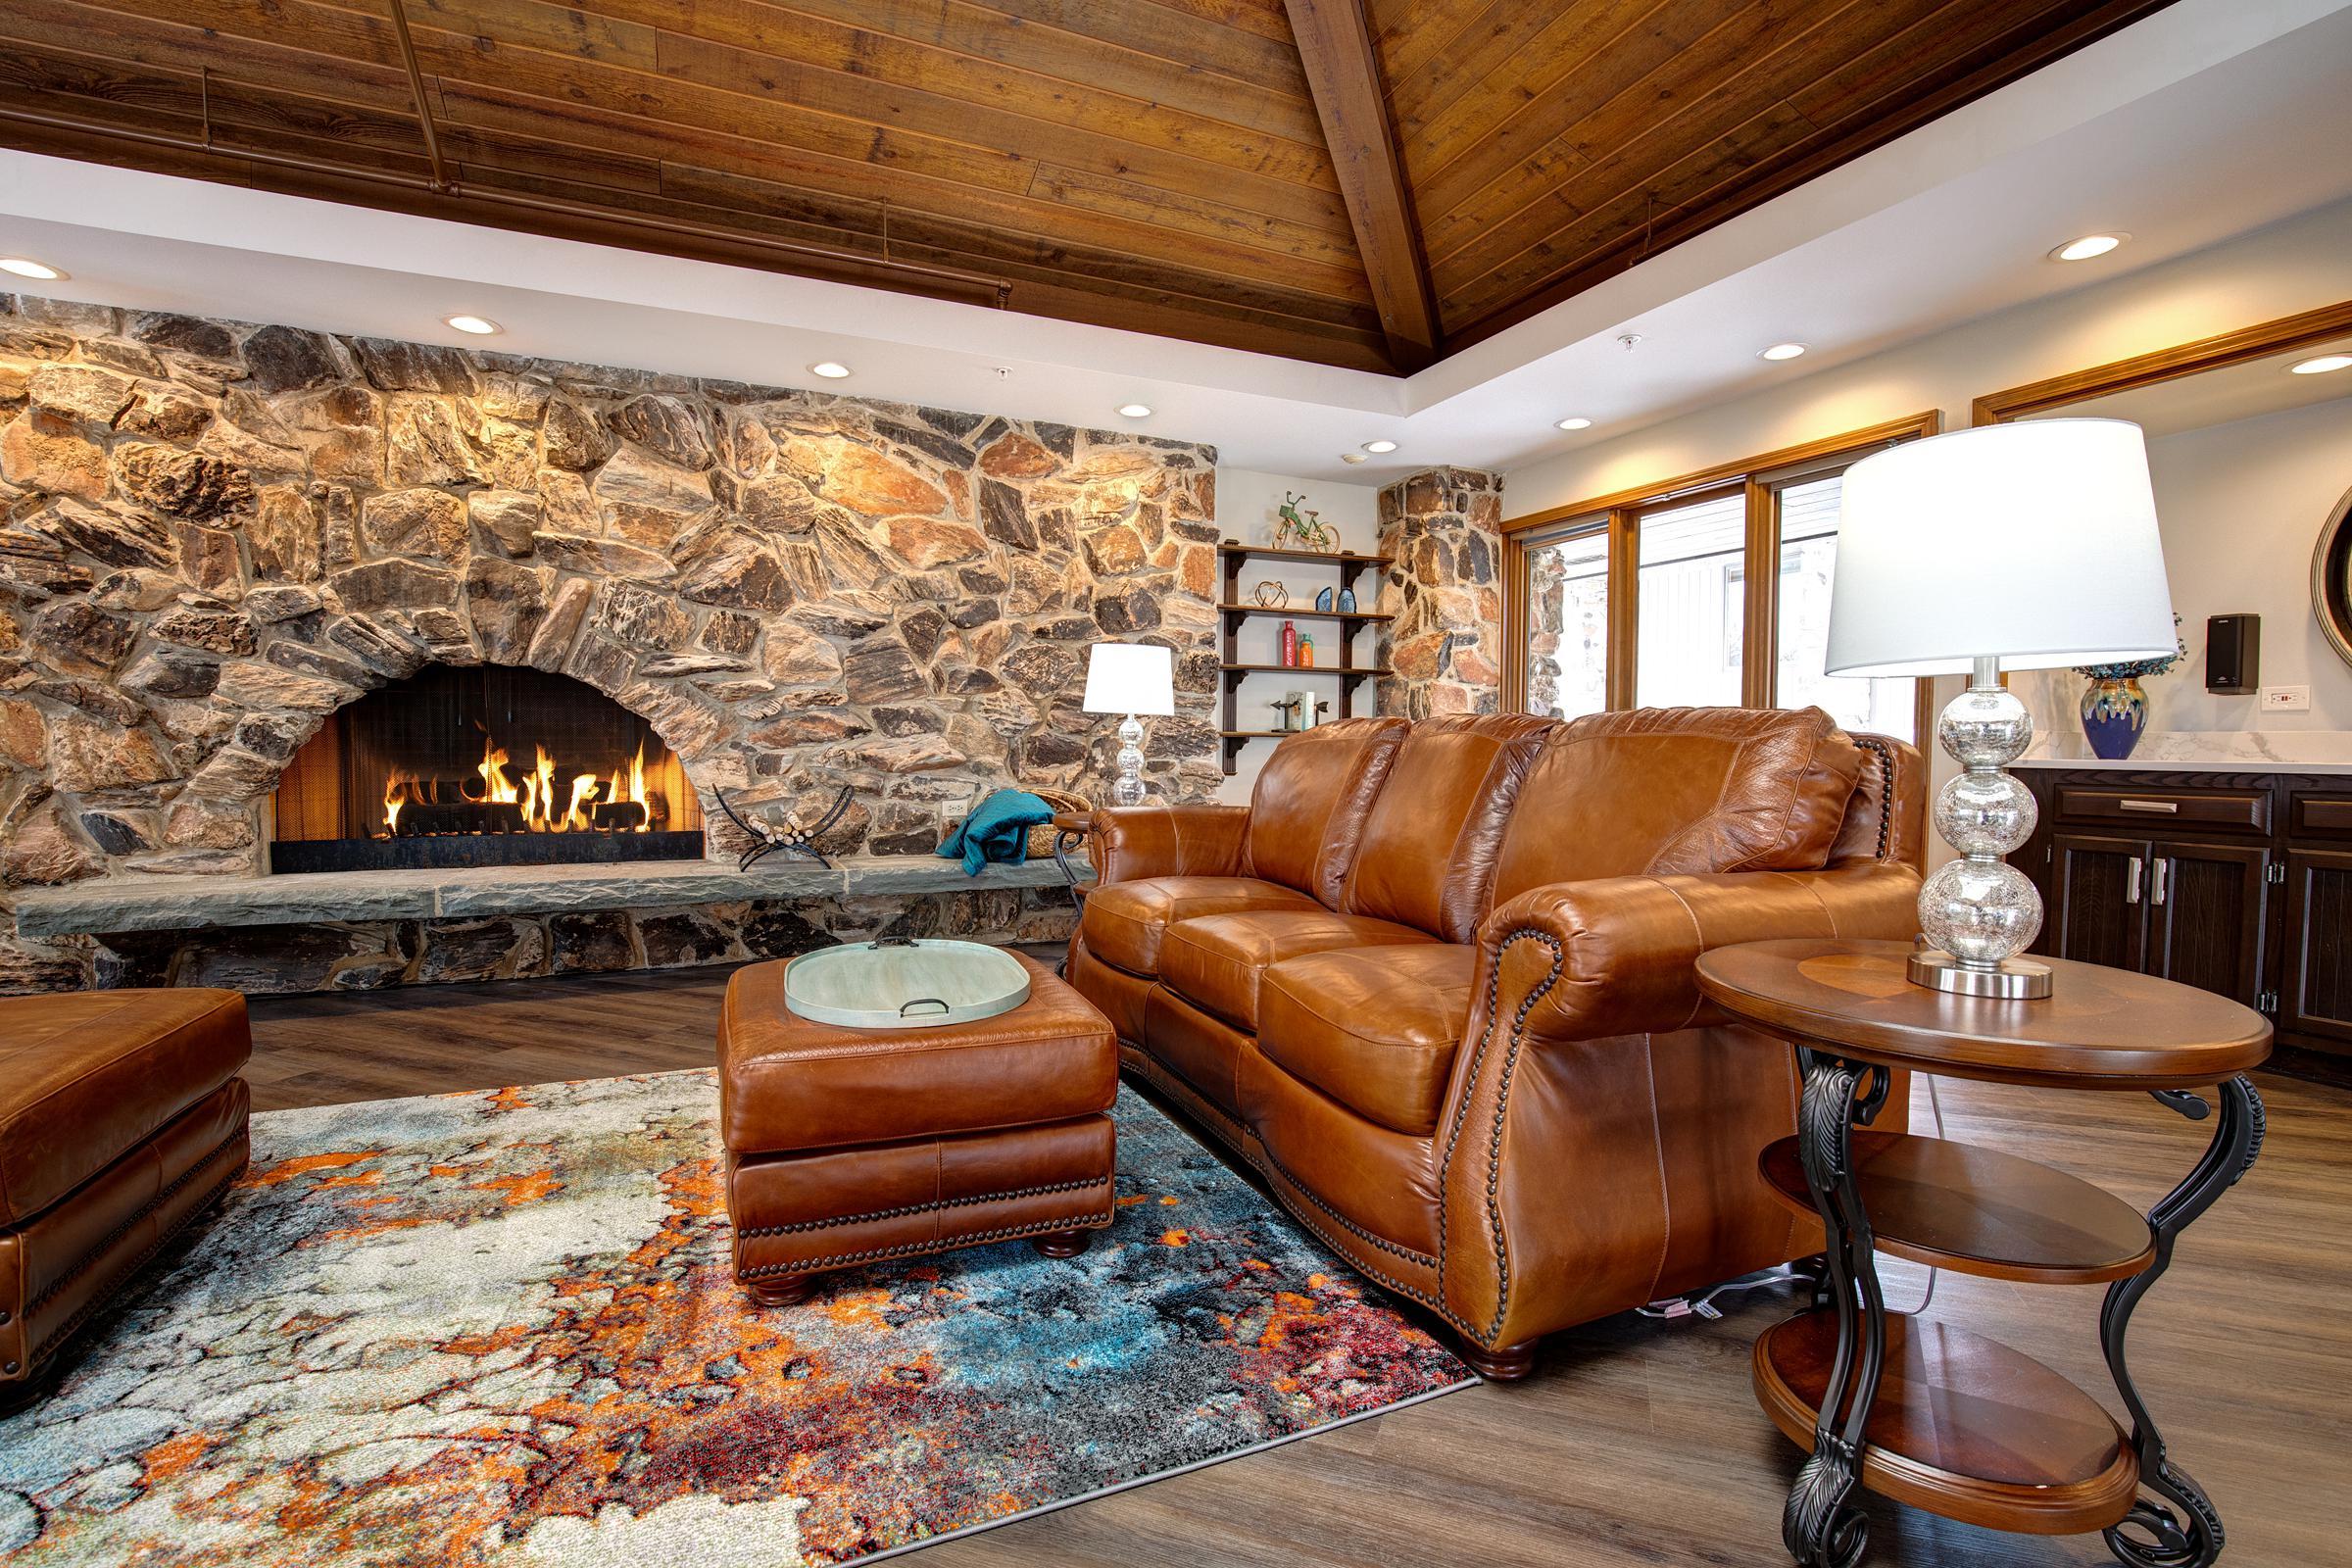 Shepherd Senior Living Bull Valley Matterport 3D Virtual Tour - couch near the fireplace